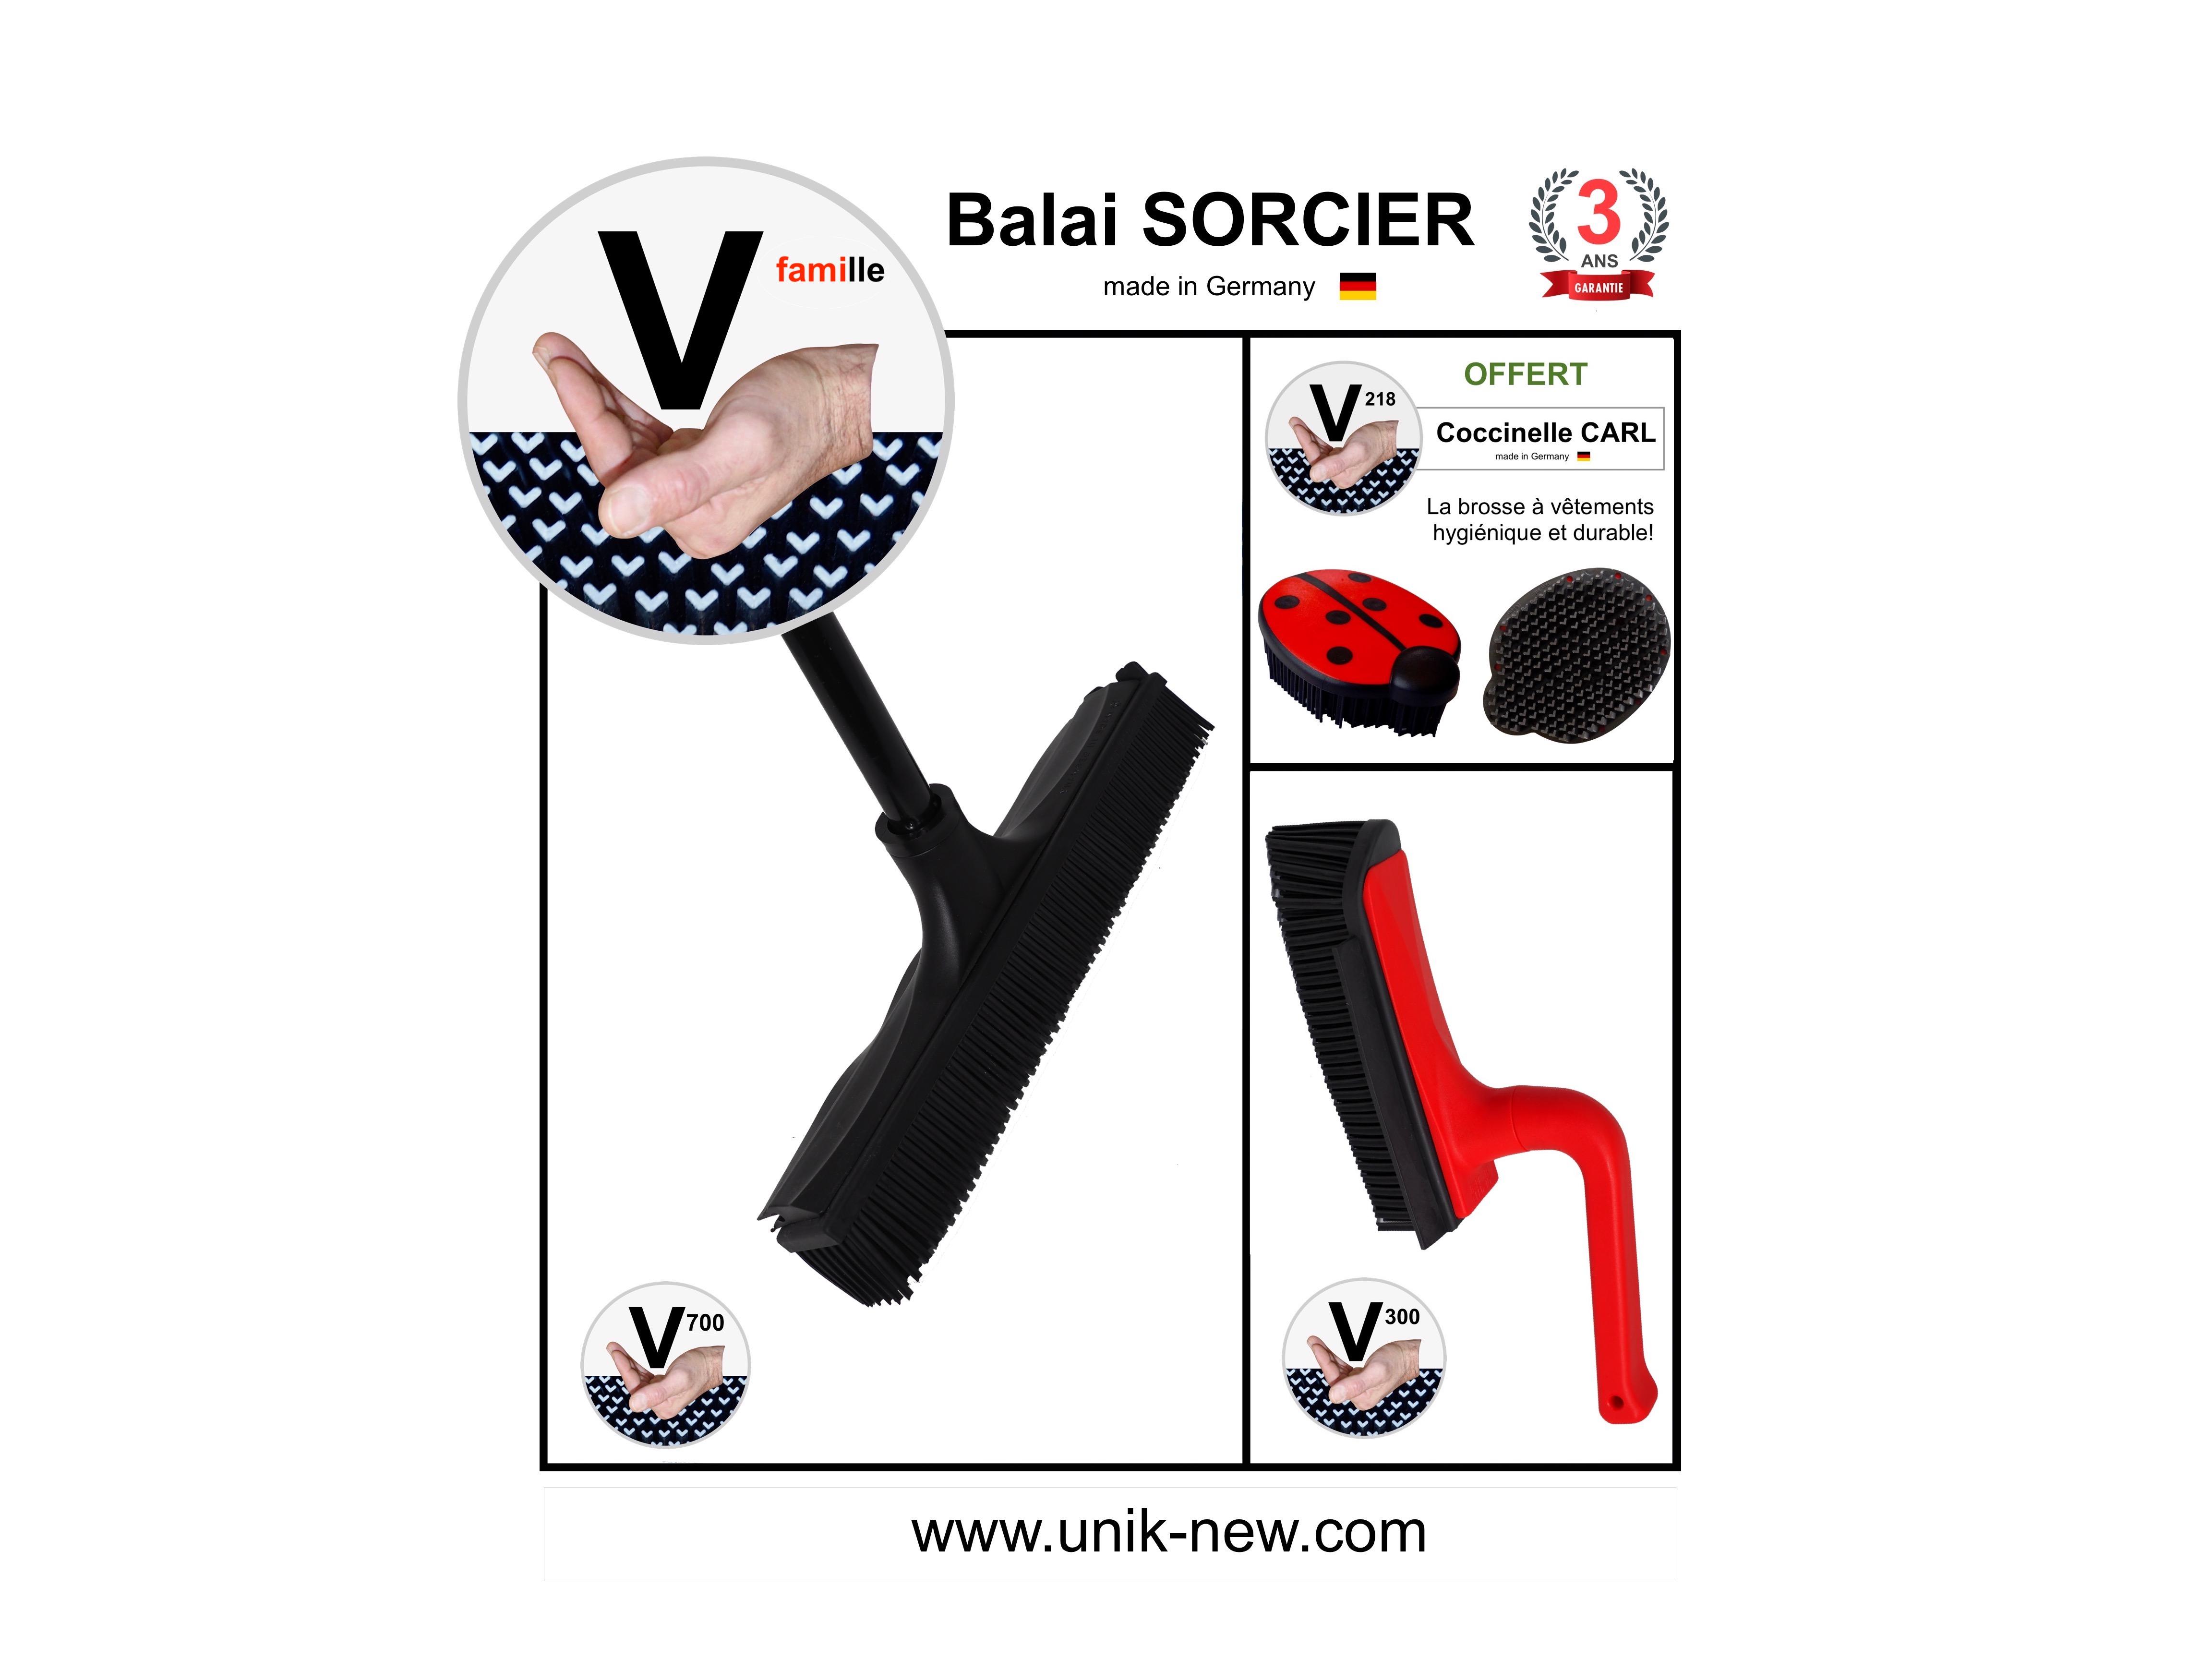 Kit Balai SORCIER V famille rouge et noir